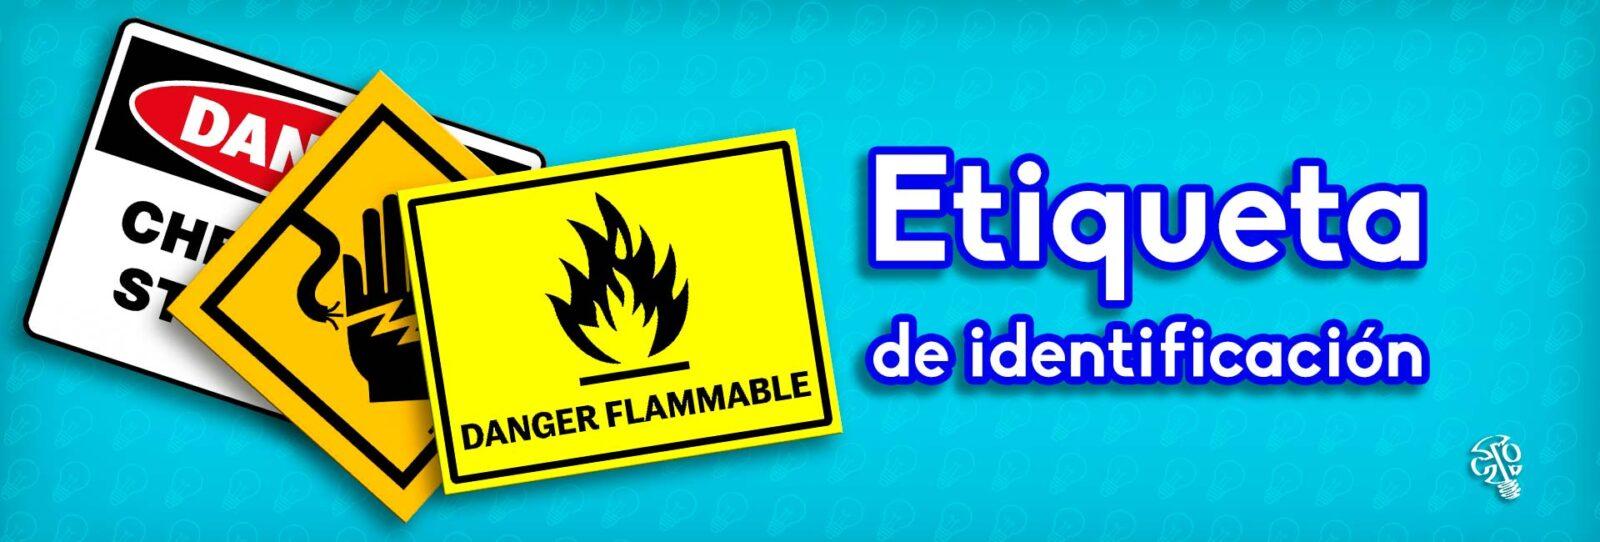 b_6_Etiquetas_identifacion